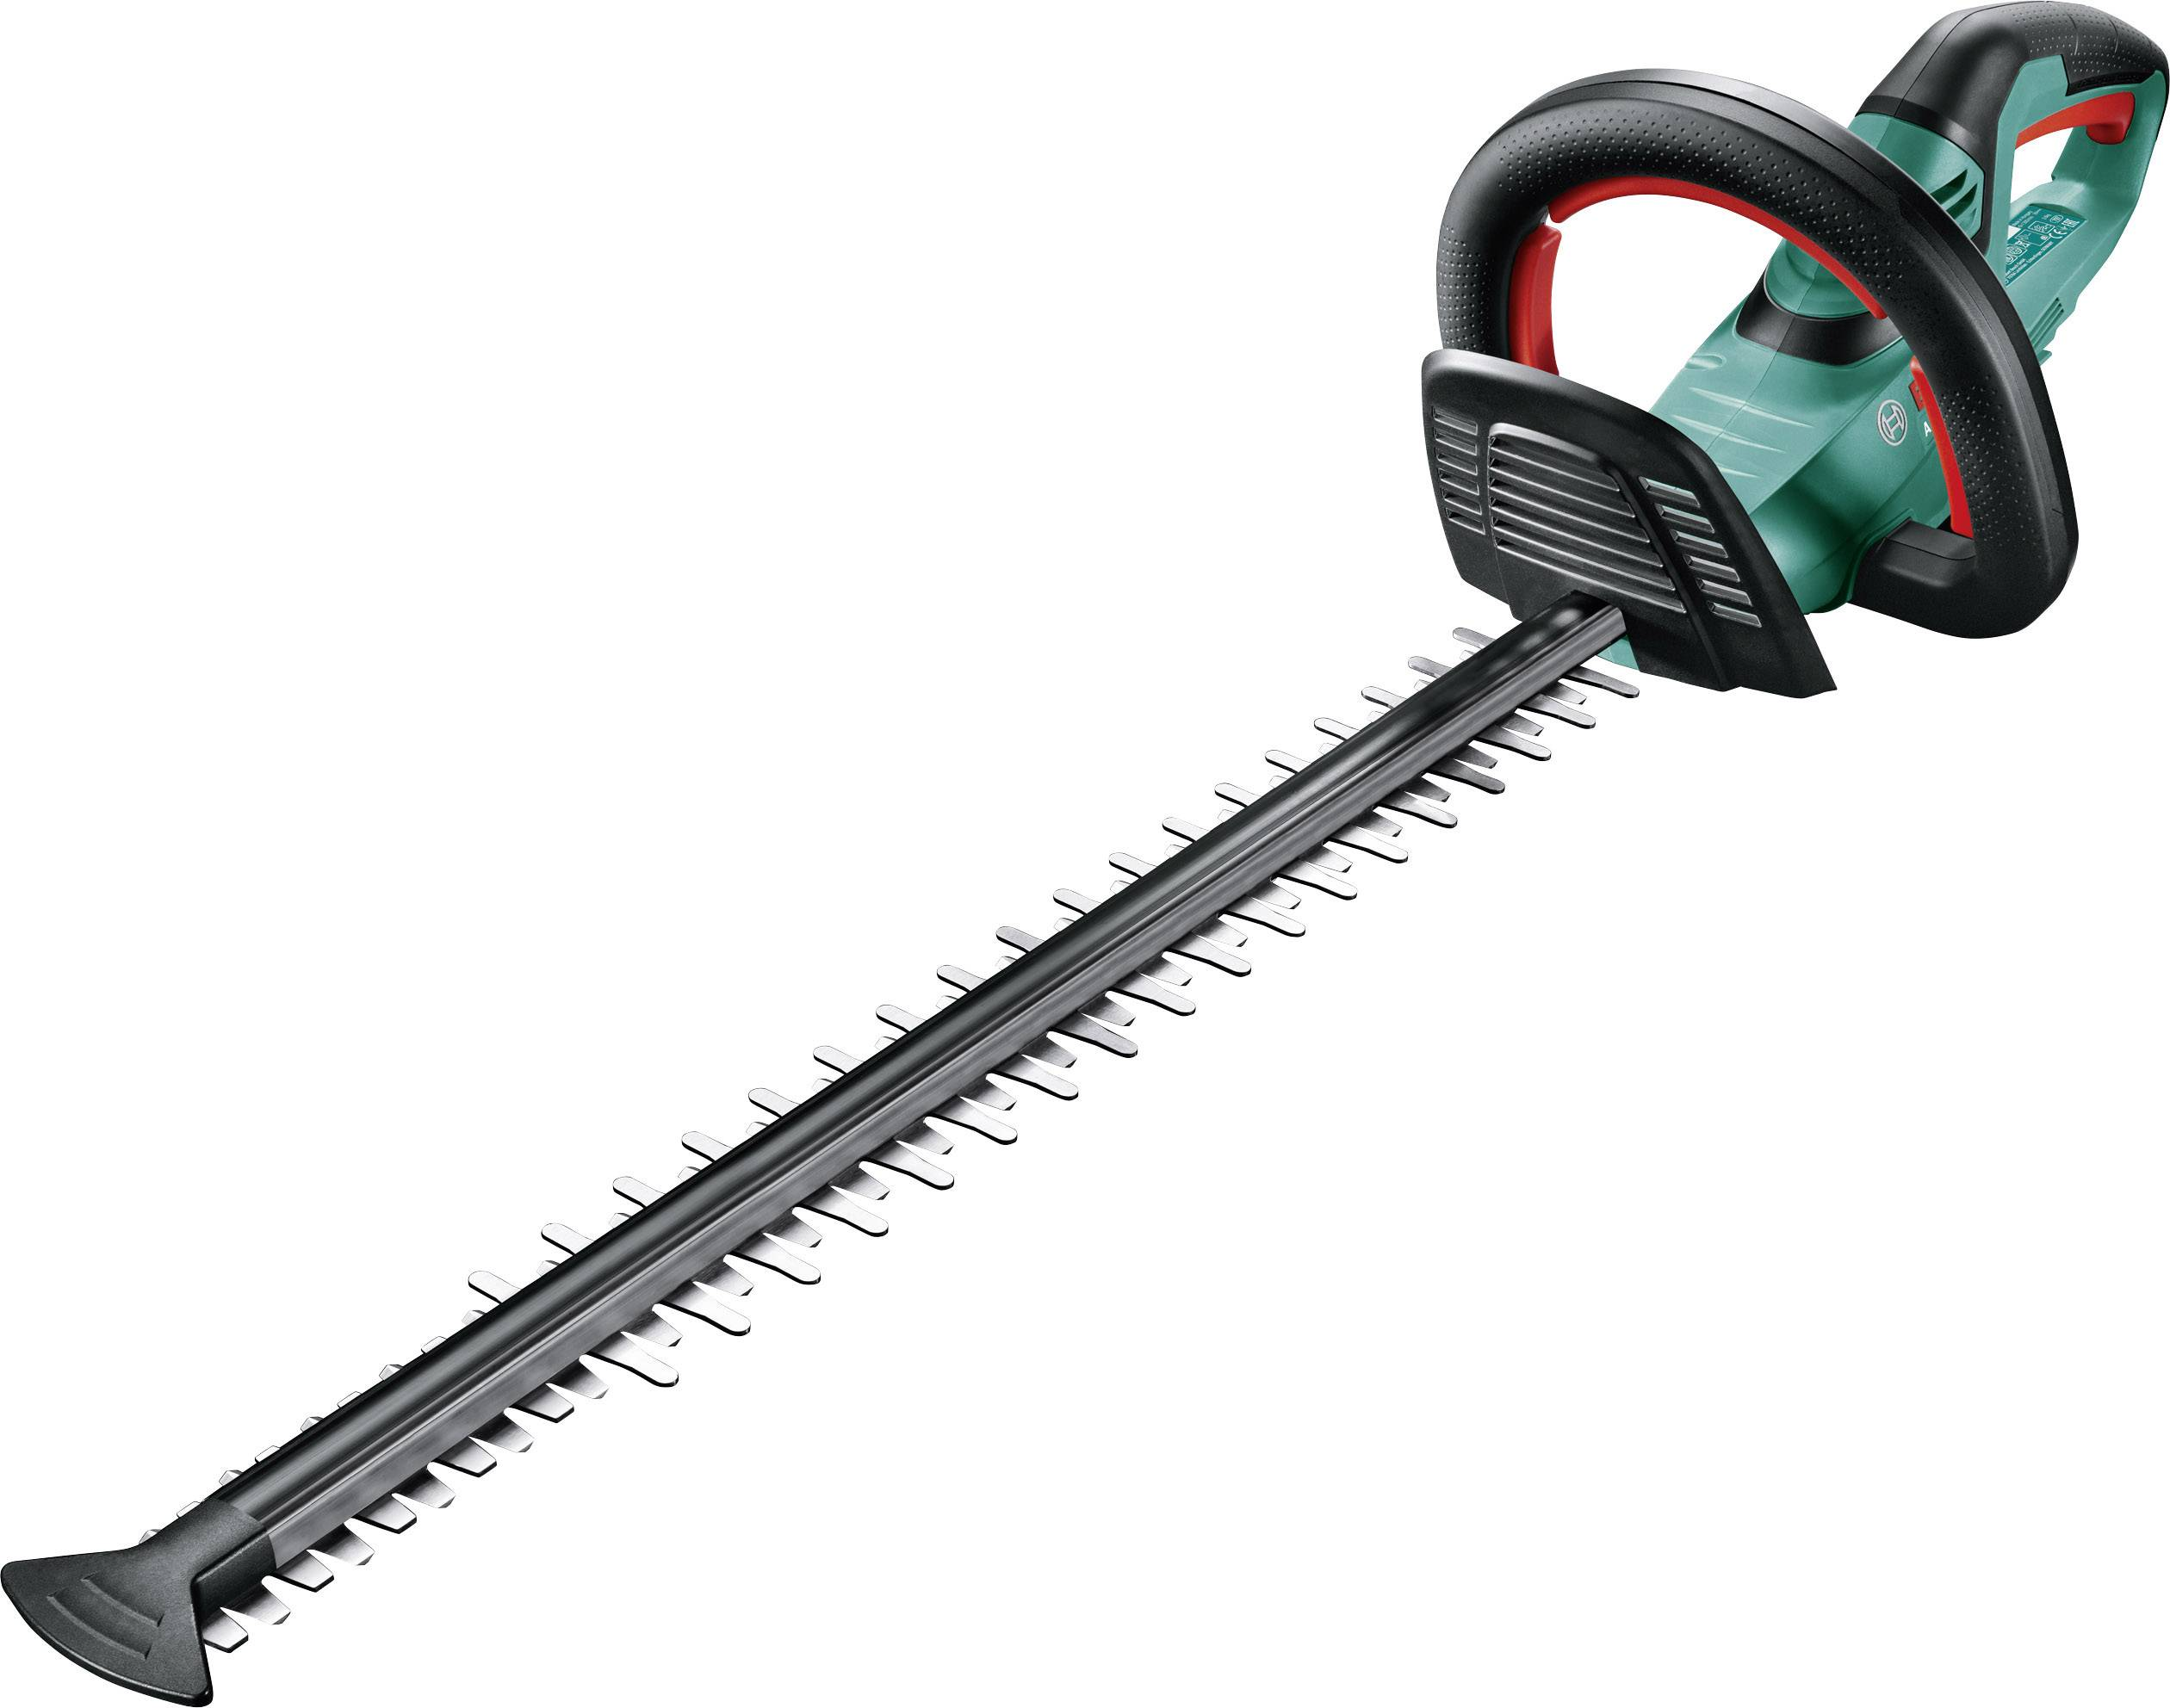 Nůžky na živý plot Bosch Home and Garden AHS 55-20 LI Power4All 0600849G02, Li-Ion akumulátor